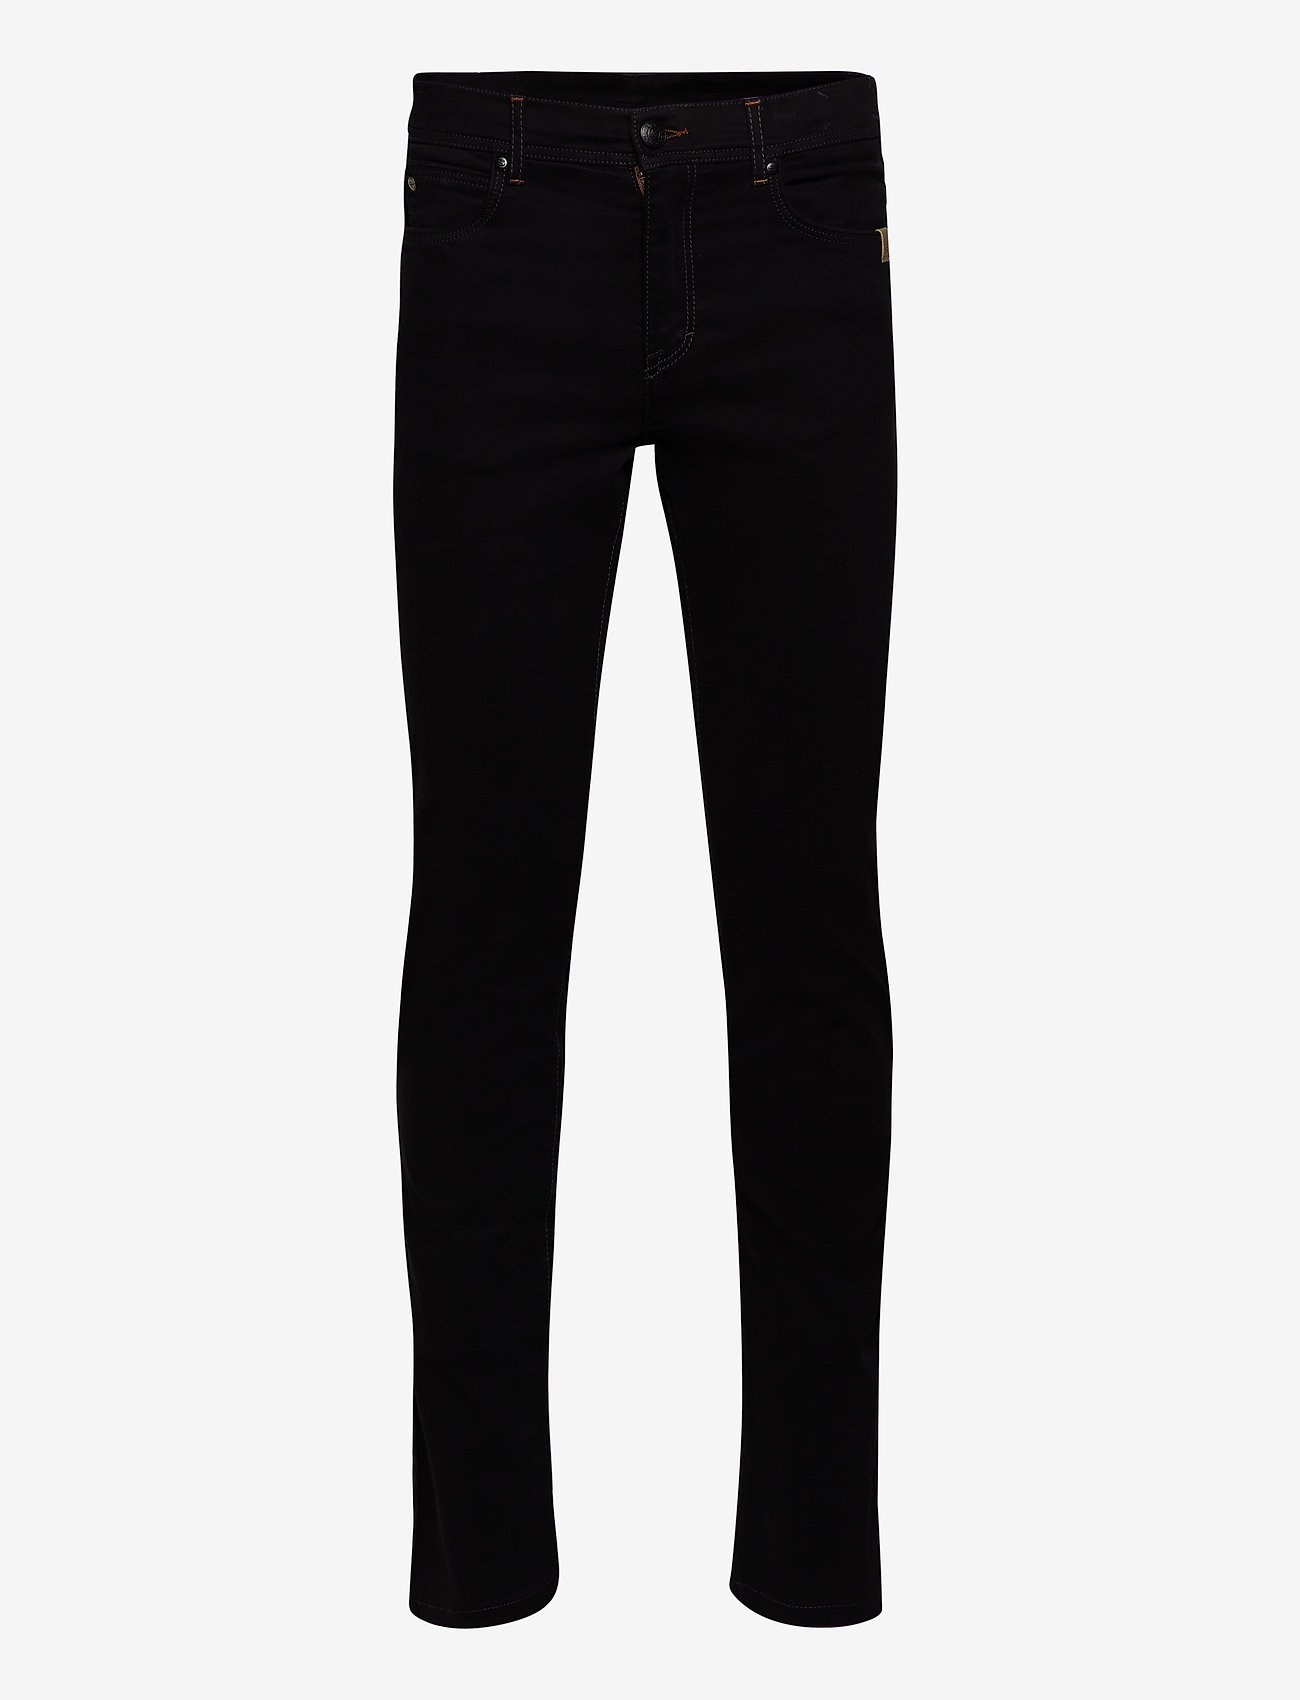 "SAND - Suede Touch - Burton NS 34"" - regular jeans - black - 0"